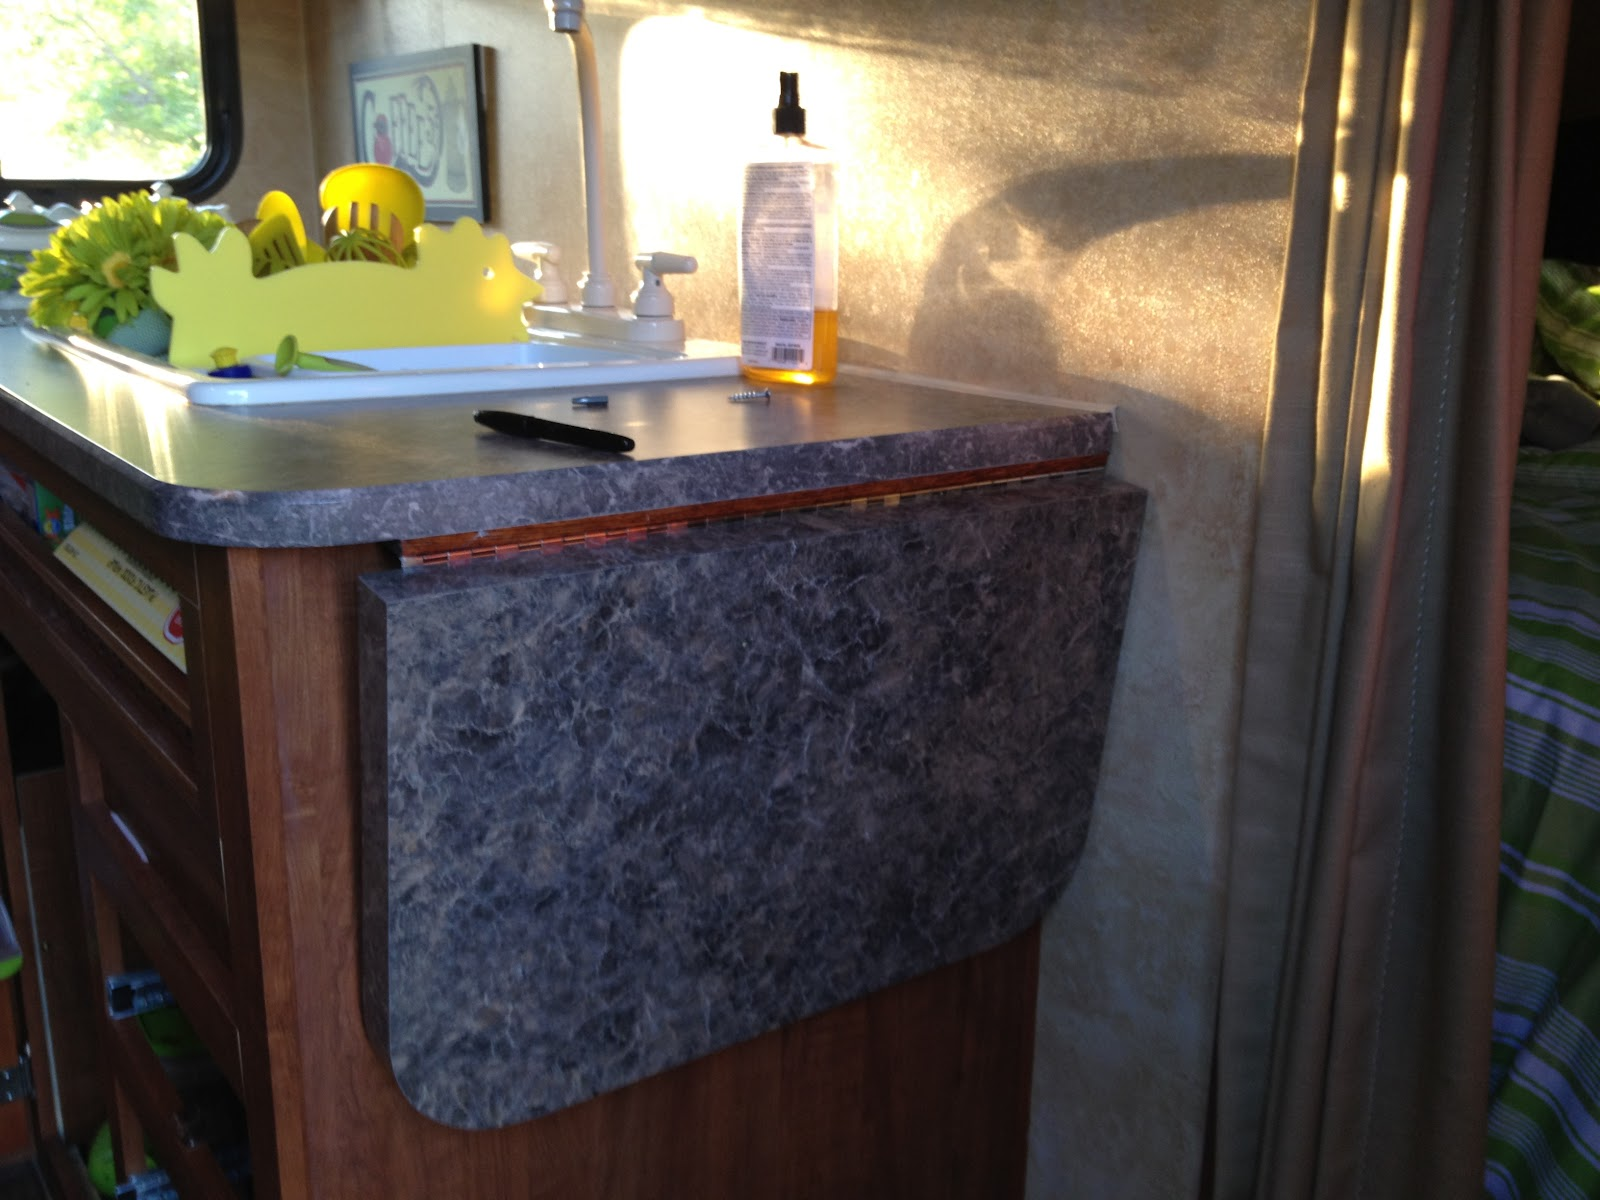 My Cool Camping Caravan Adventures